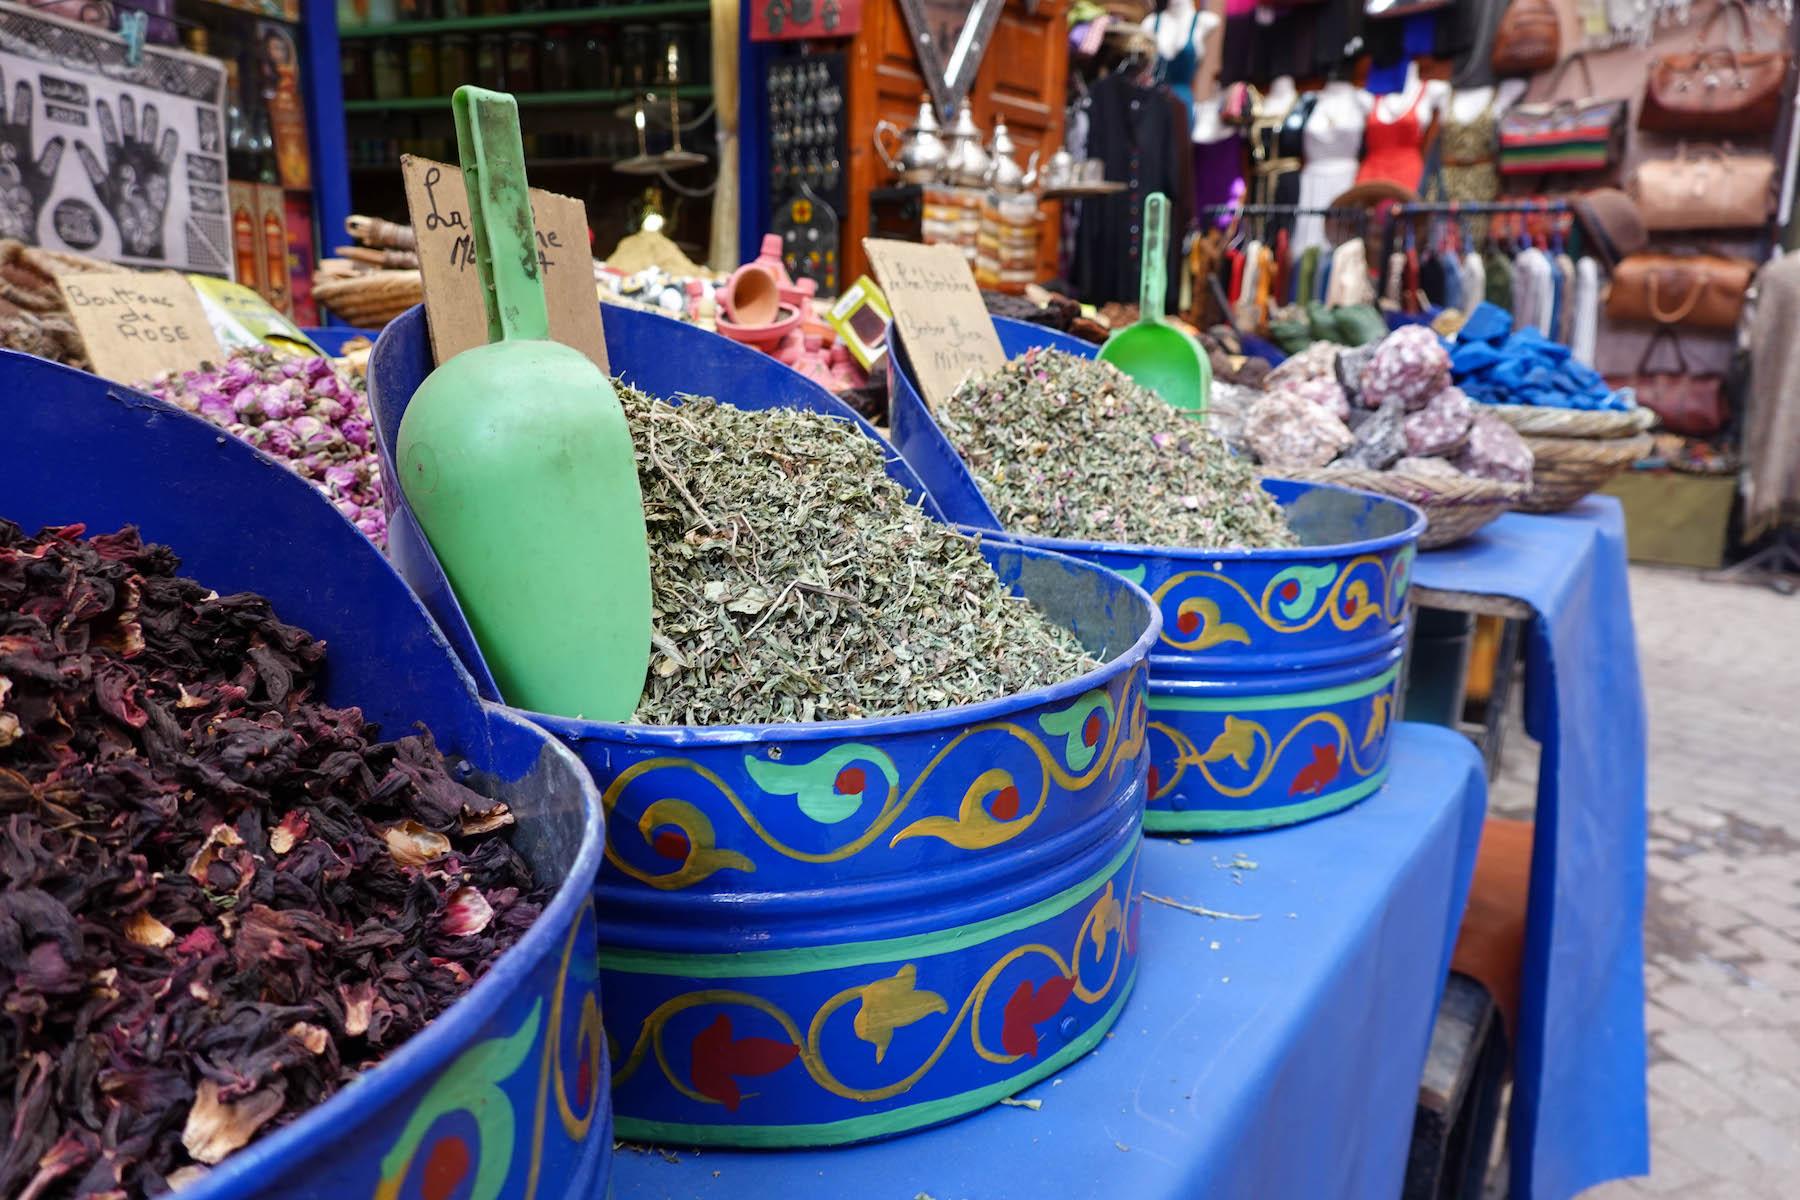 Suelovesnyc_Tipps_Marrakesch_Reise_Marrakech_Marrakesch_Urlaub_souks